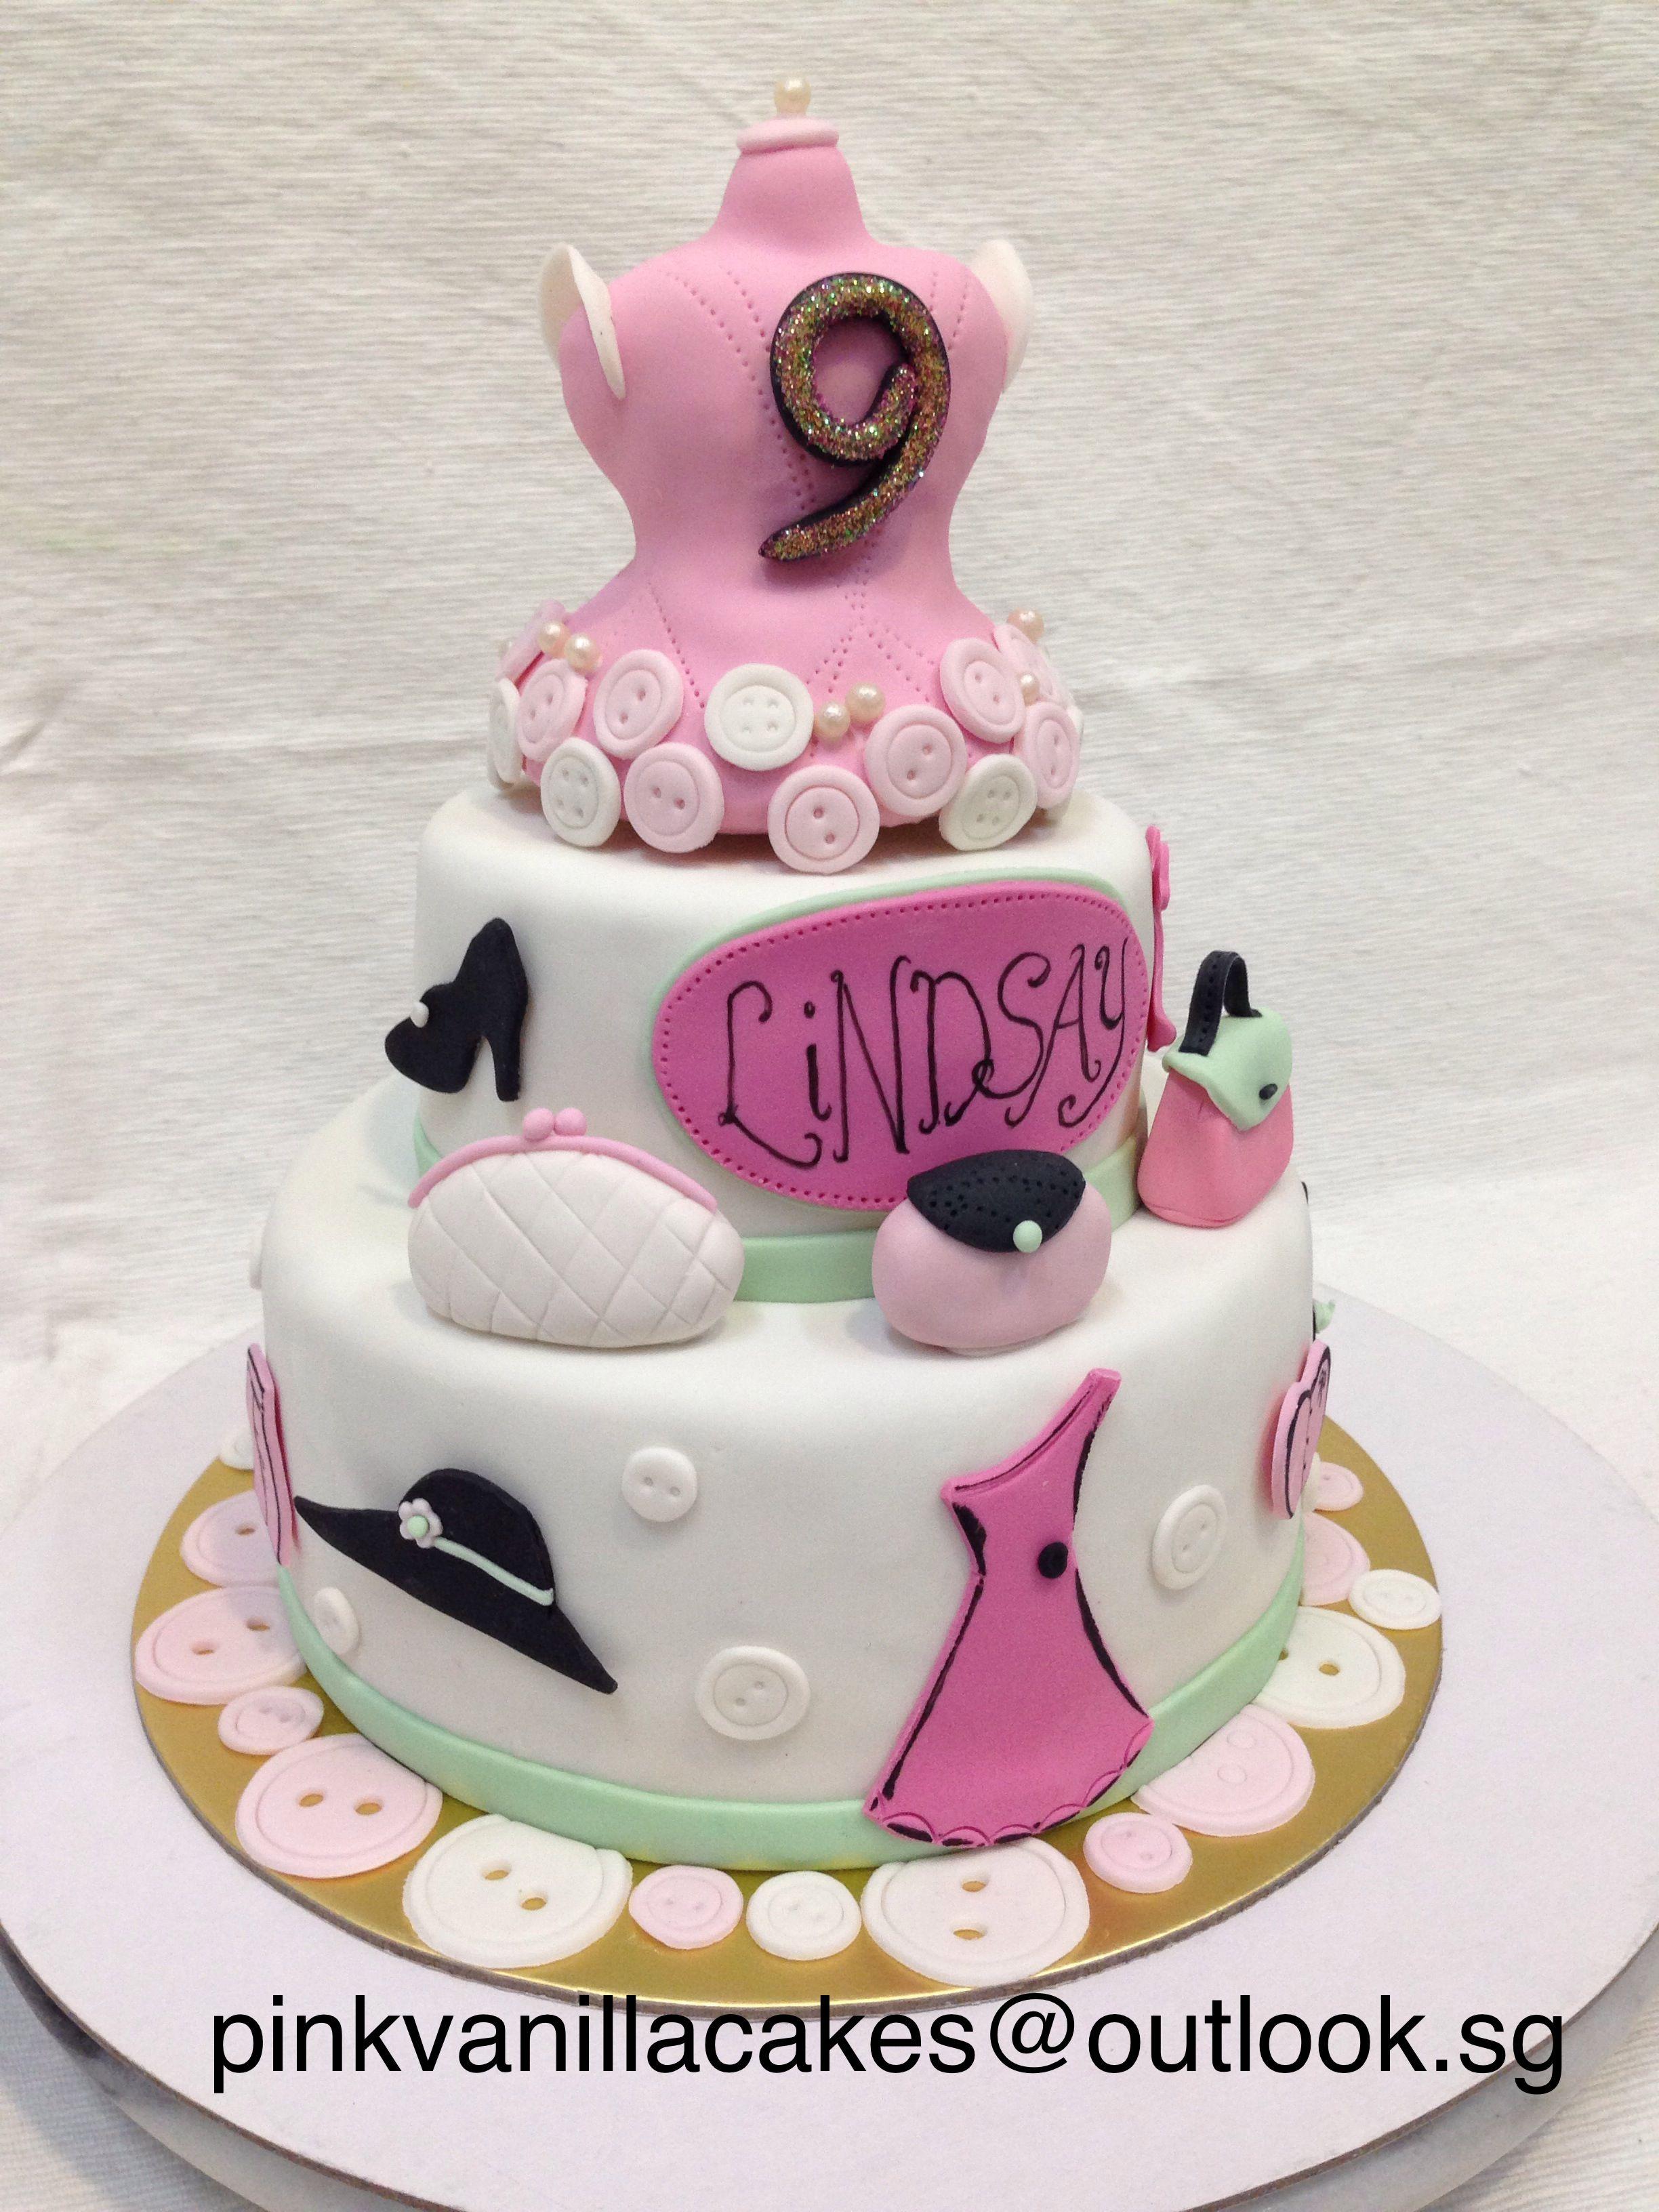 fashion birthday cake 3D birthday cake Singapore fashionista